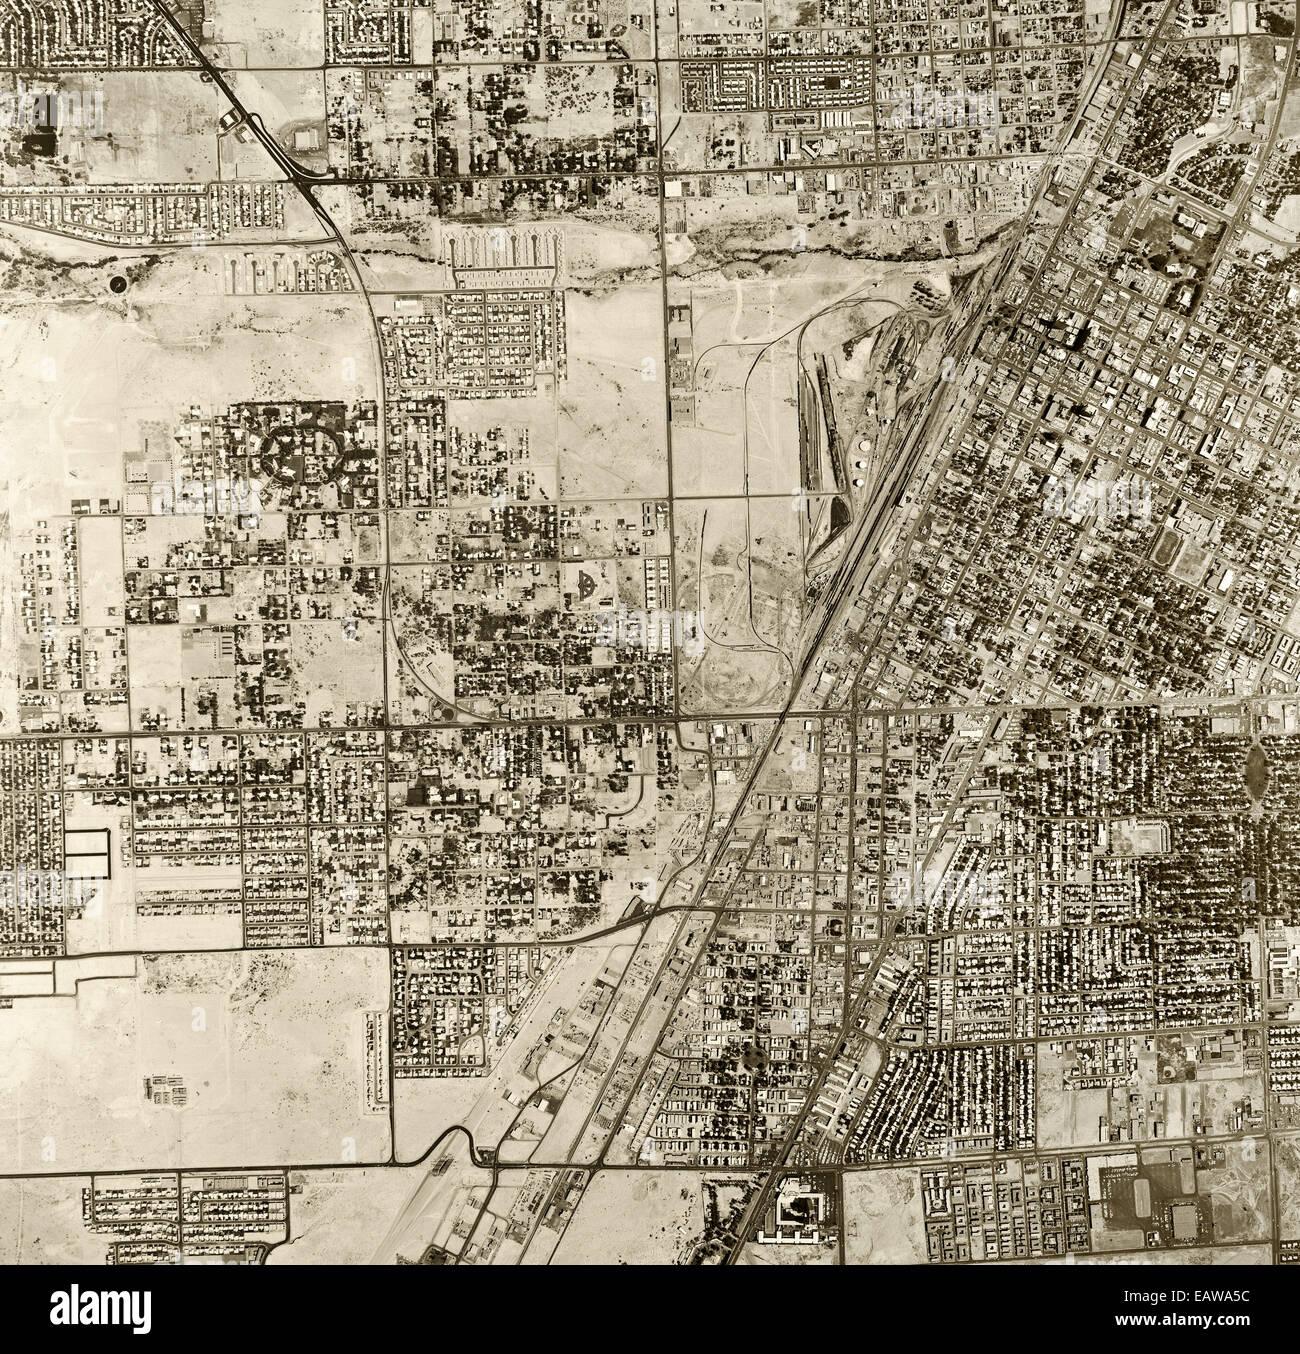 historical aerial photograph Las Vegas, Nevada, 1965 - Stock Image